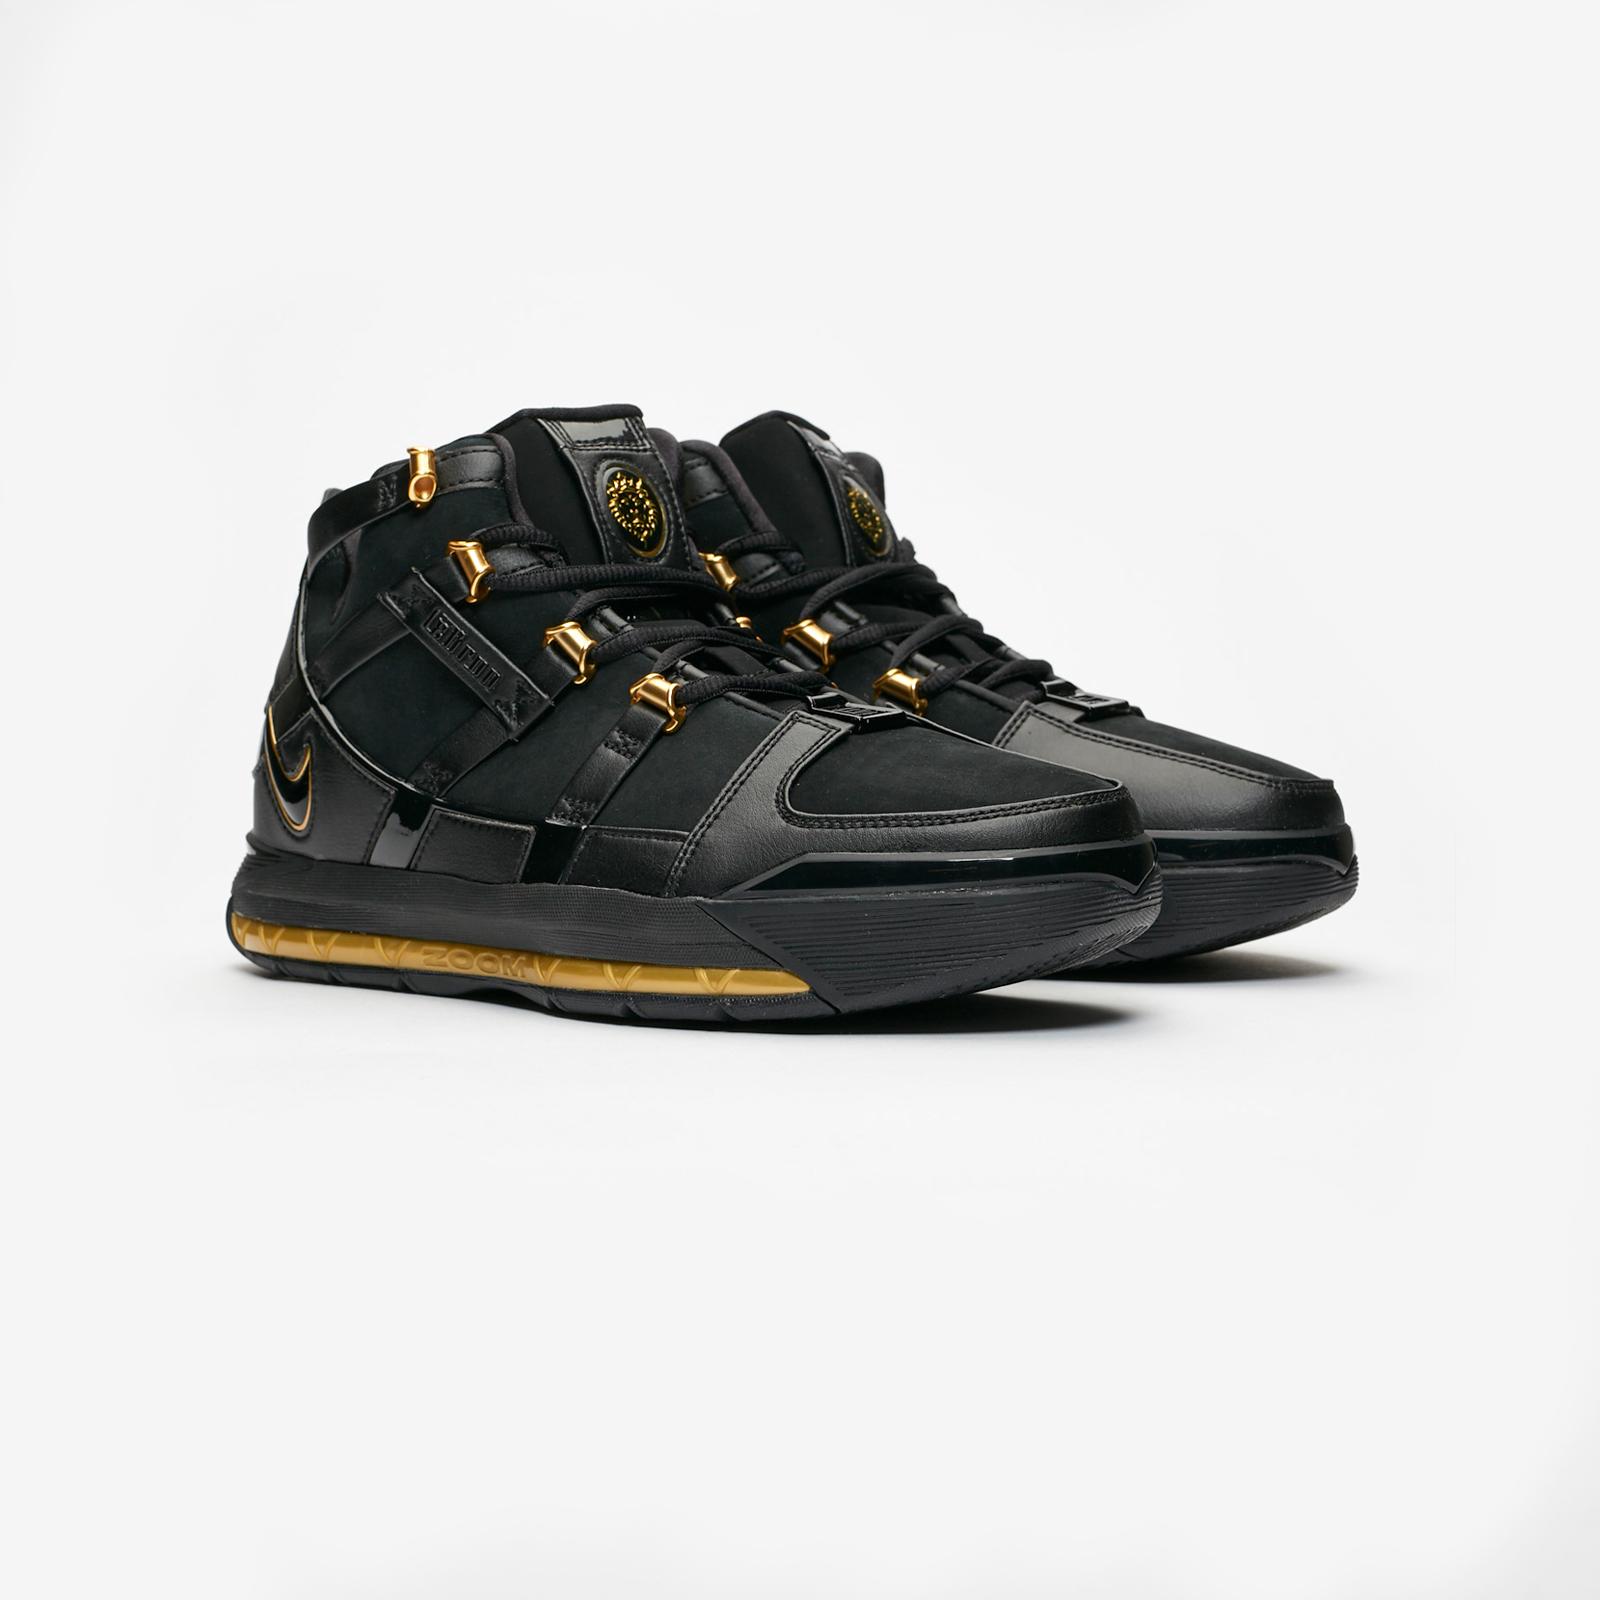 276e0ad1336 Nike Zoom LeBron III QS - Ao2434-001 - Sneakersnstuff